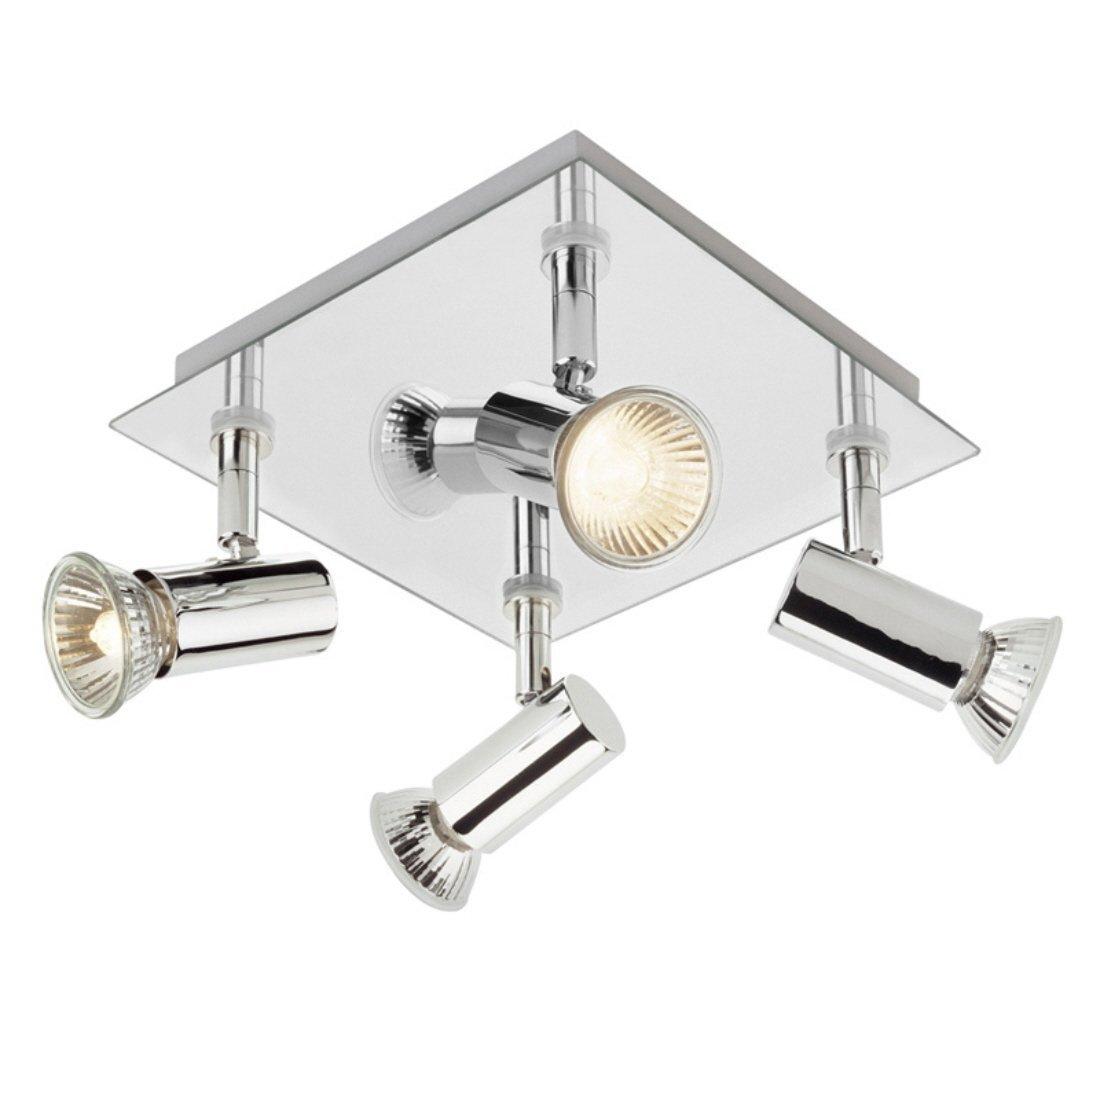 Modern square chrome 4 way gu10 ceiling spotlight amazon modern square chrome 4 way gu10 ceiling spotlight amazon lighting aloadofball Choice Image